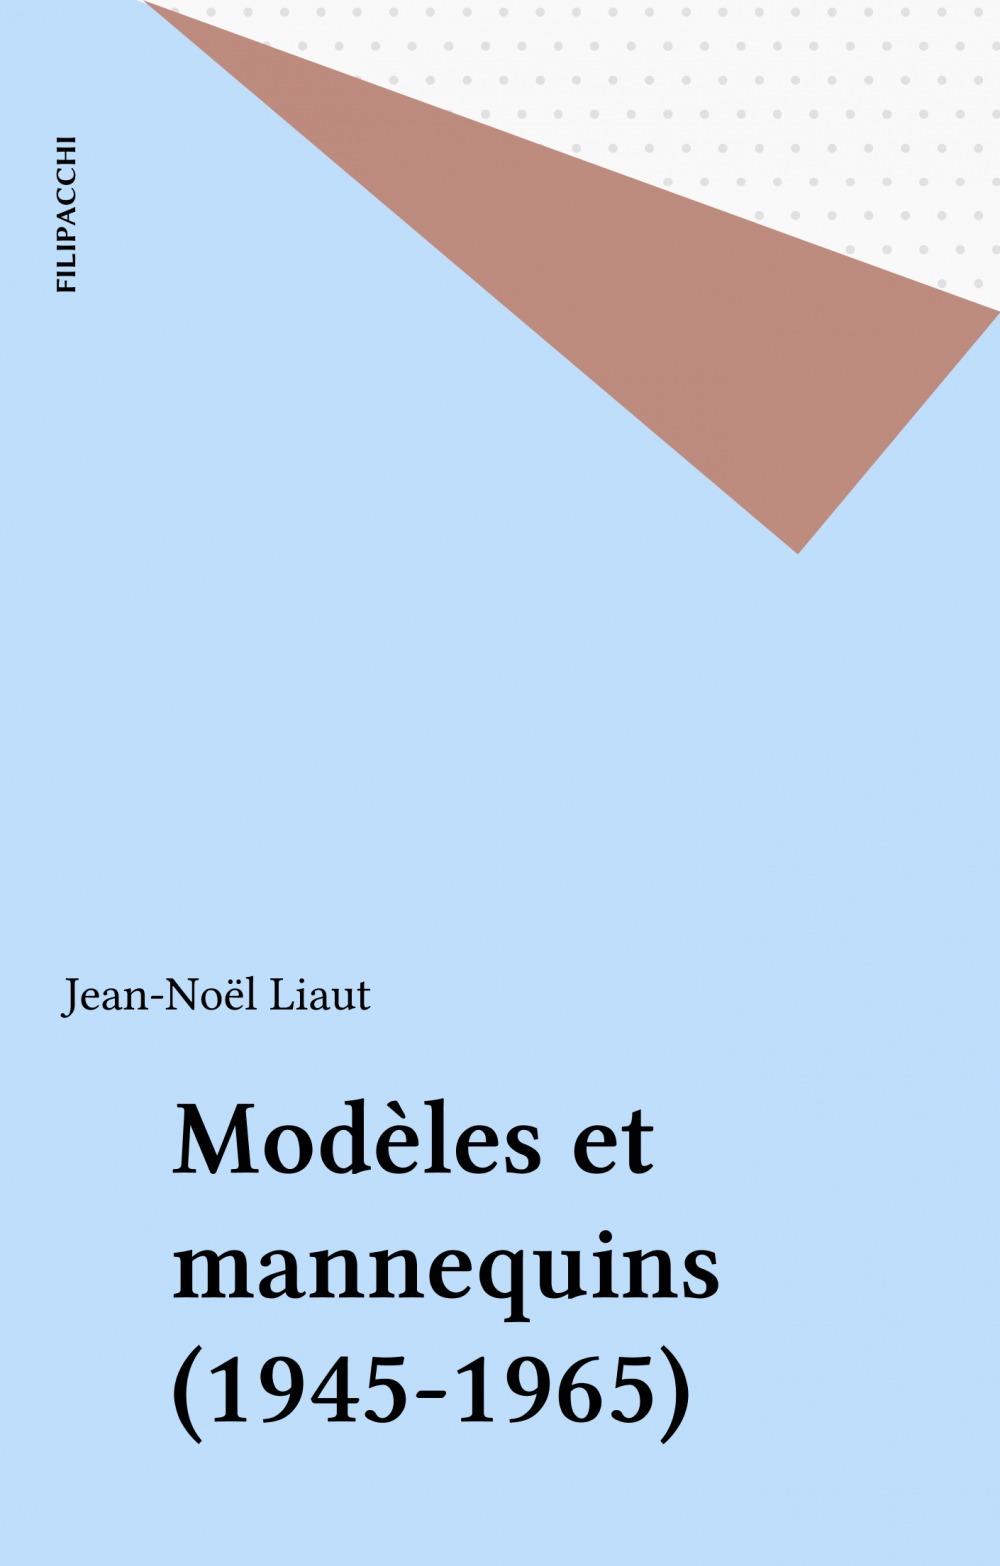 Modeles et mannequins